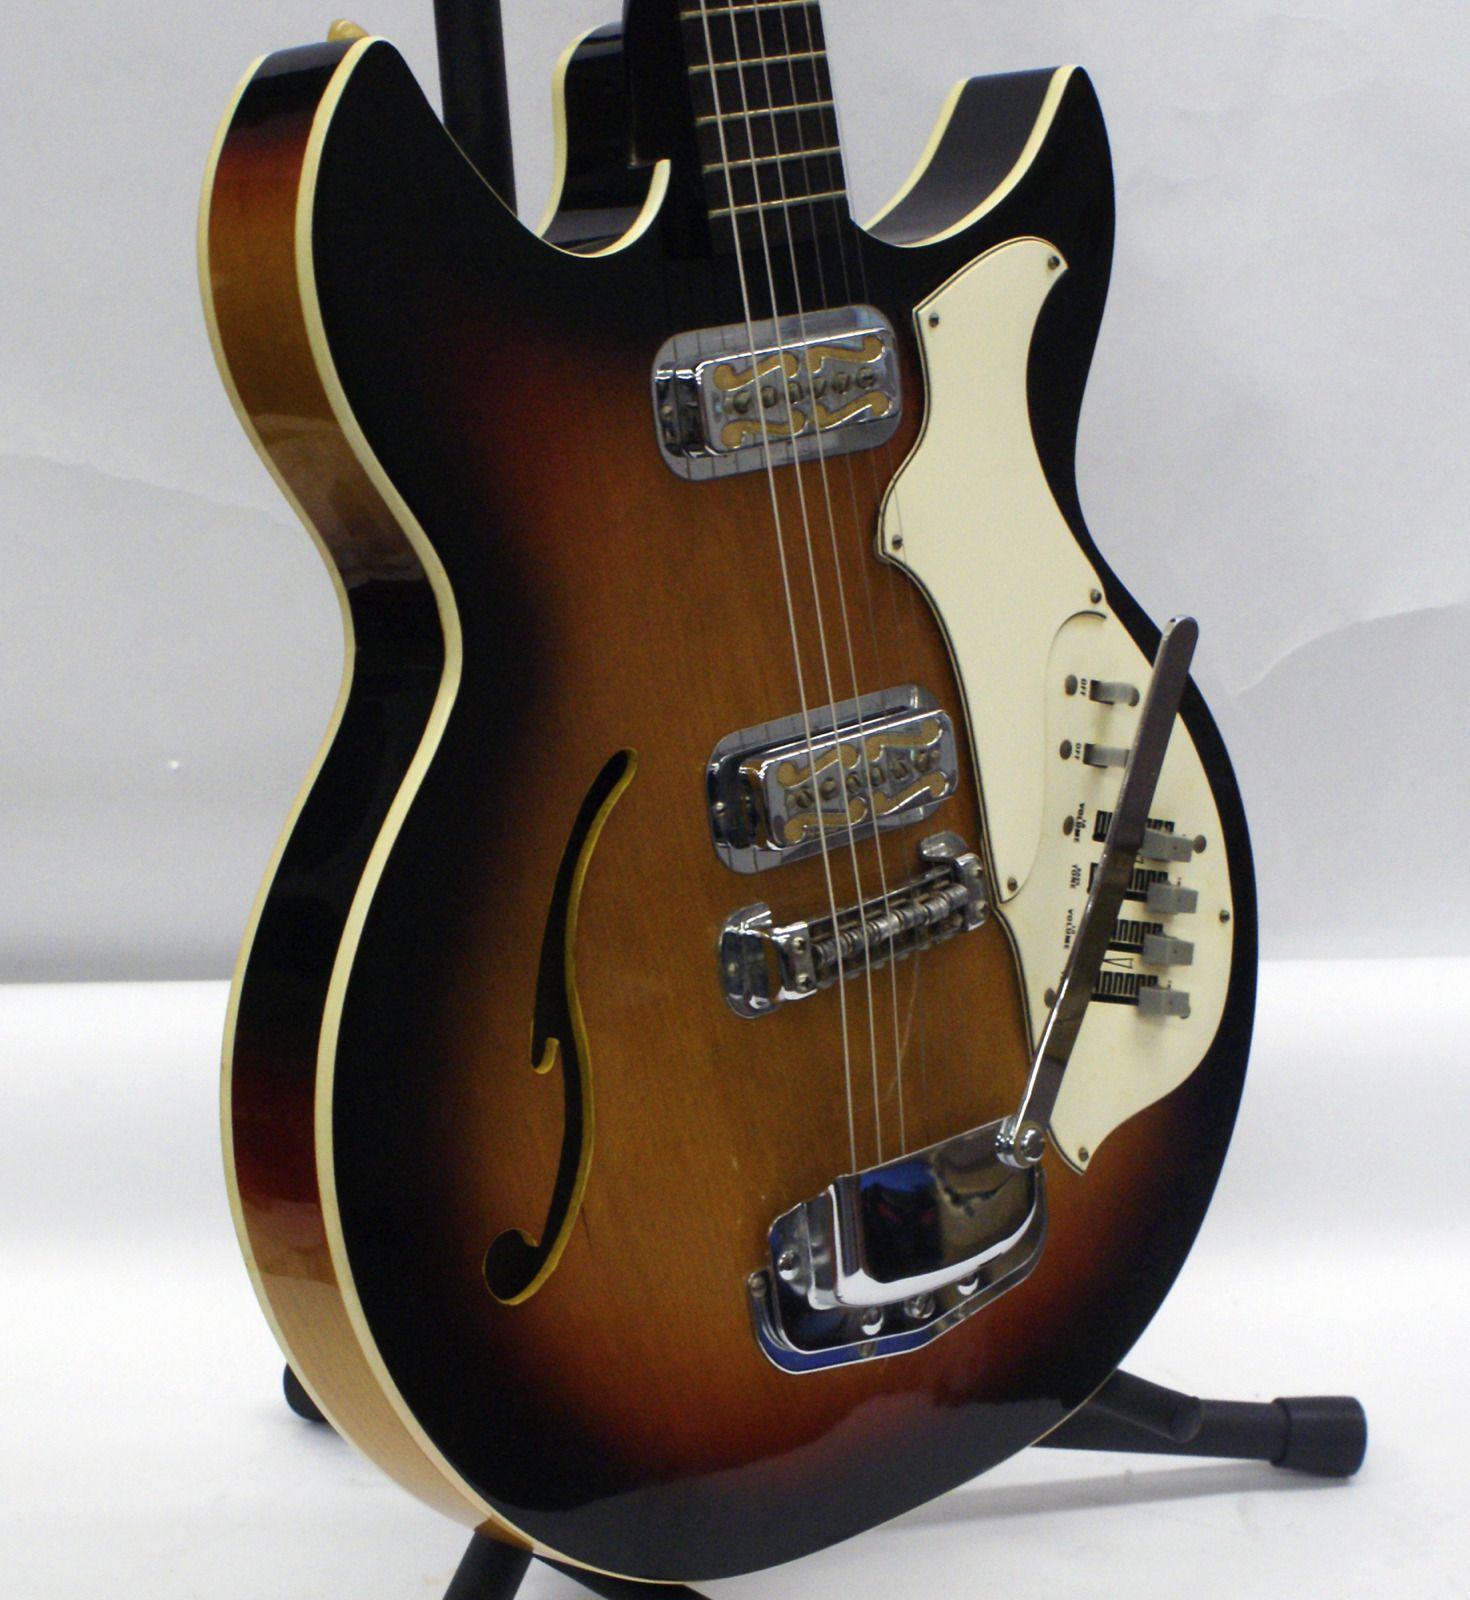 Harmony Les Paul Guitar Wiring Diagram Schemes Electric Vintage 68 69 H82 W Dearmond Gold Foil Model History